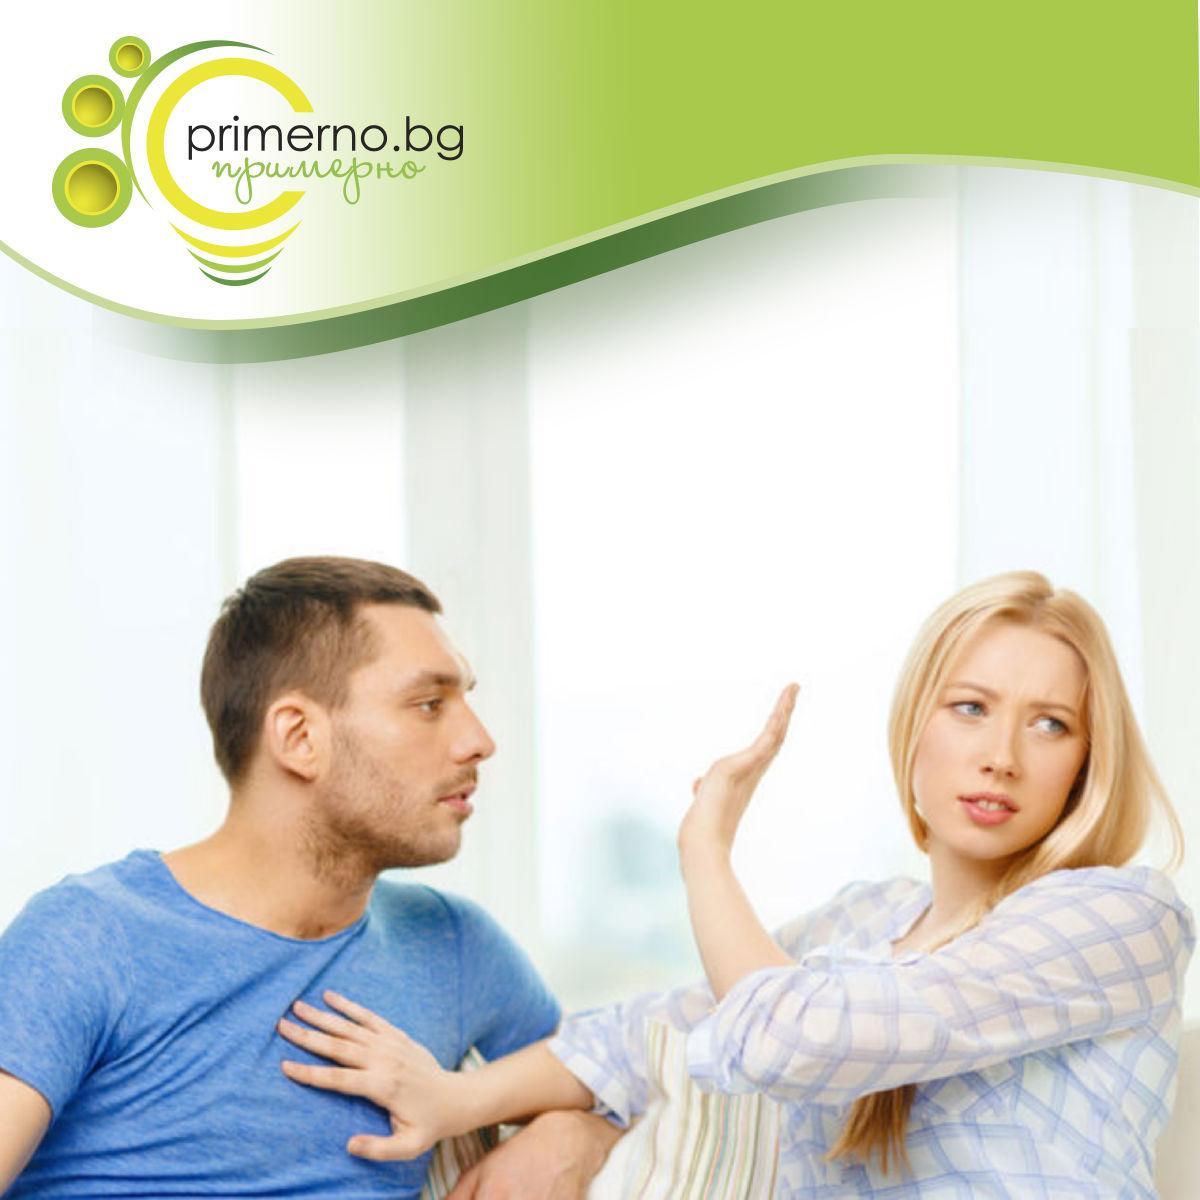 laska-vztah-problem-odmietanie-clanokW